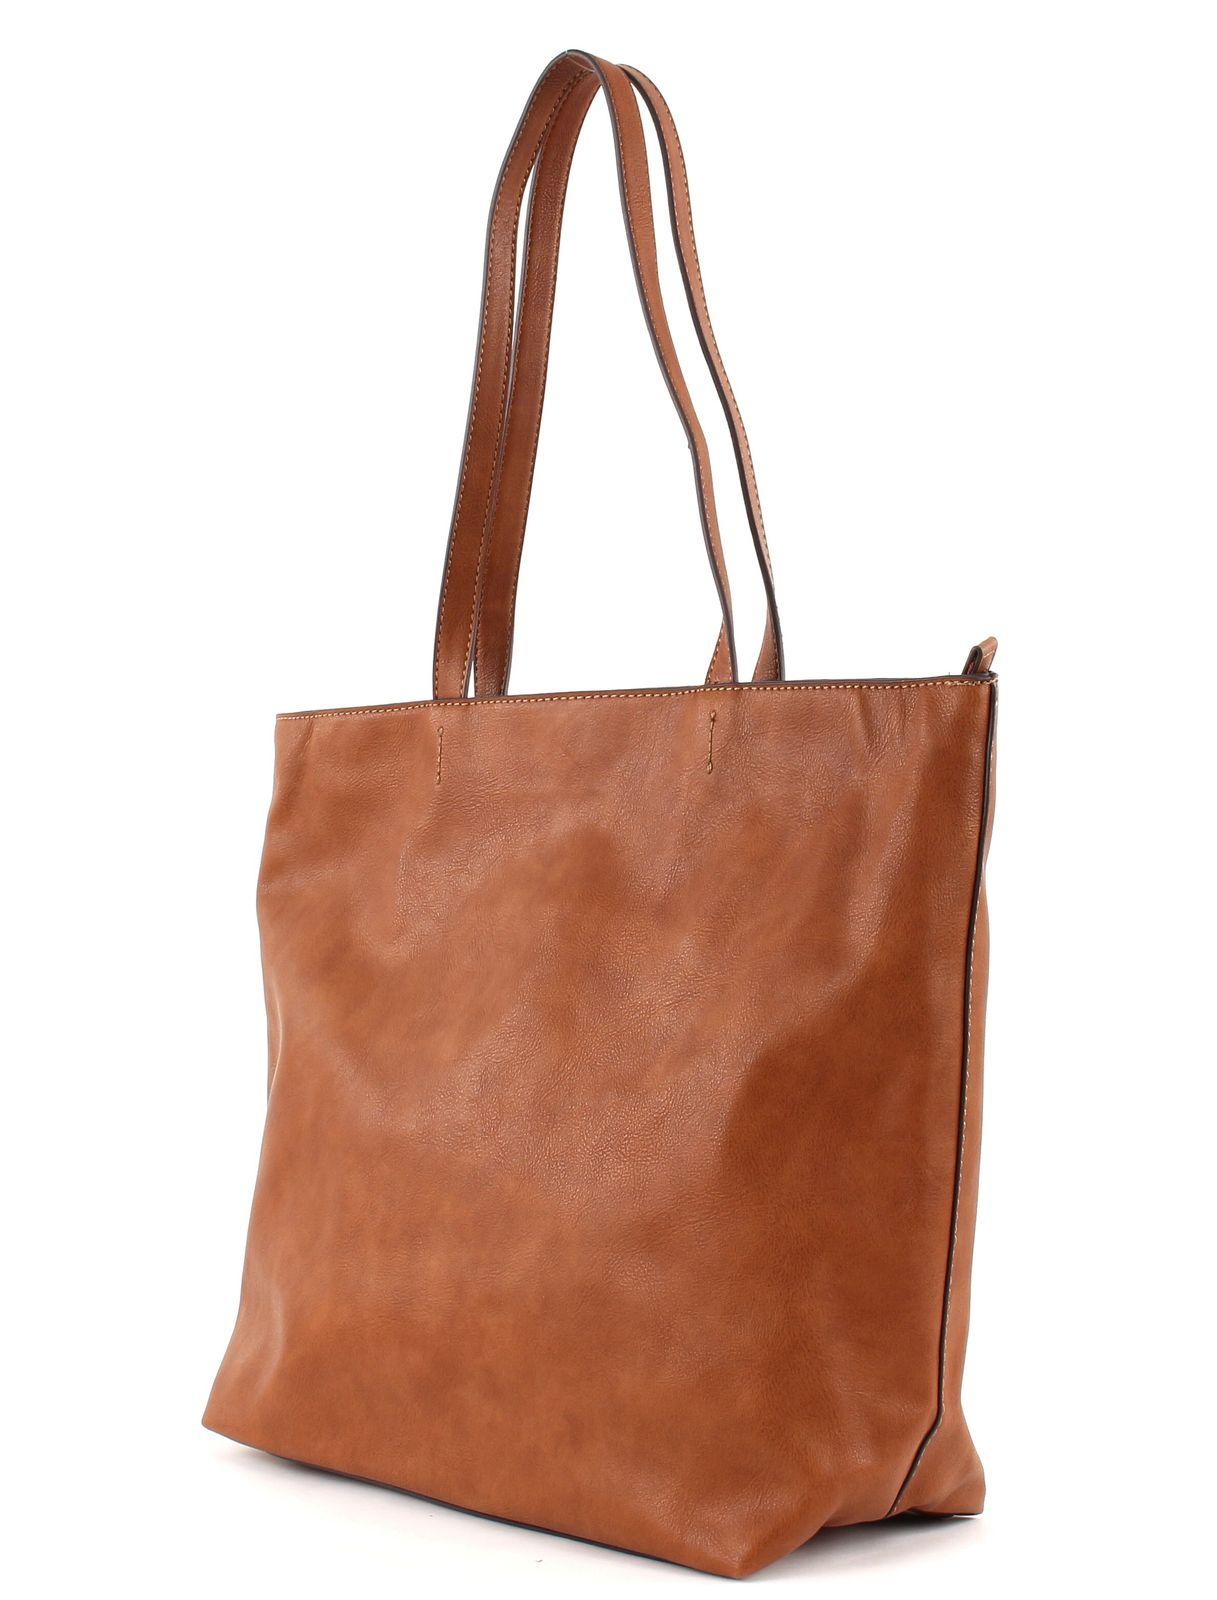 esprit odina shopper tasche schultertasche shopper handtasche rust brown braun ebay. Black Bedroom Furniture Sets. Home Design Ideas